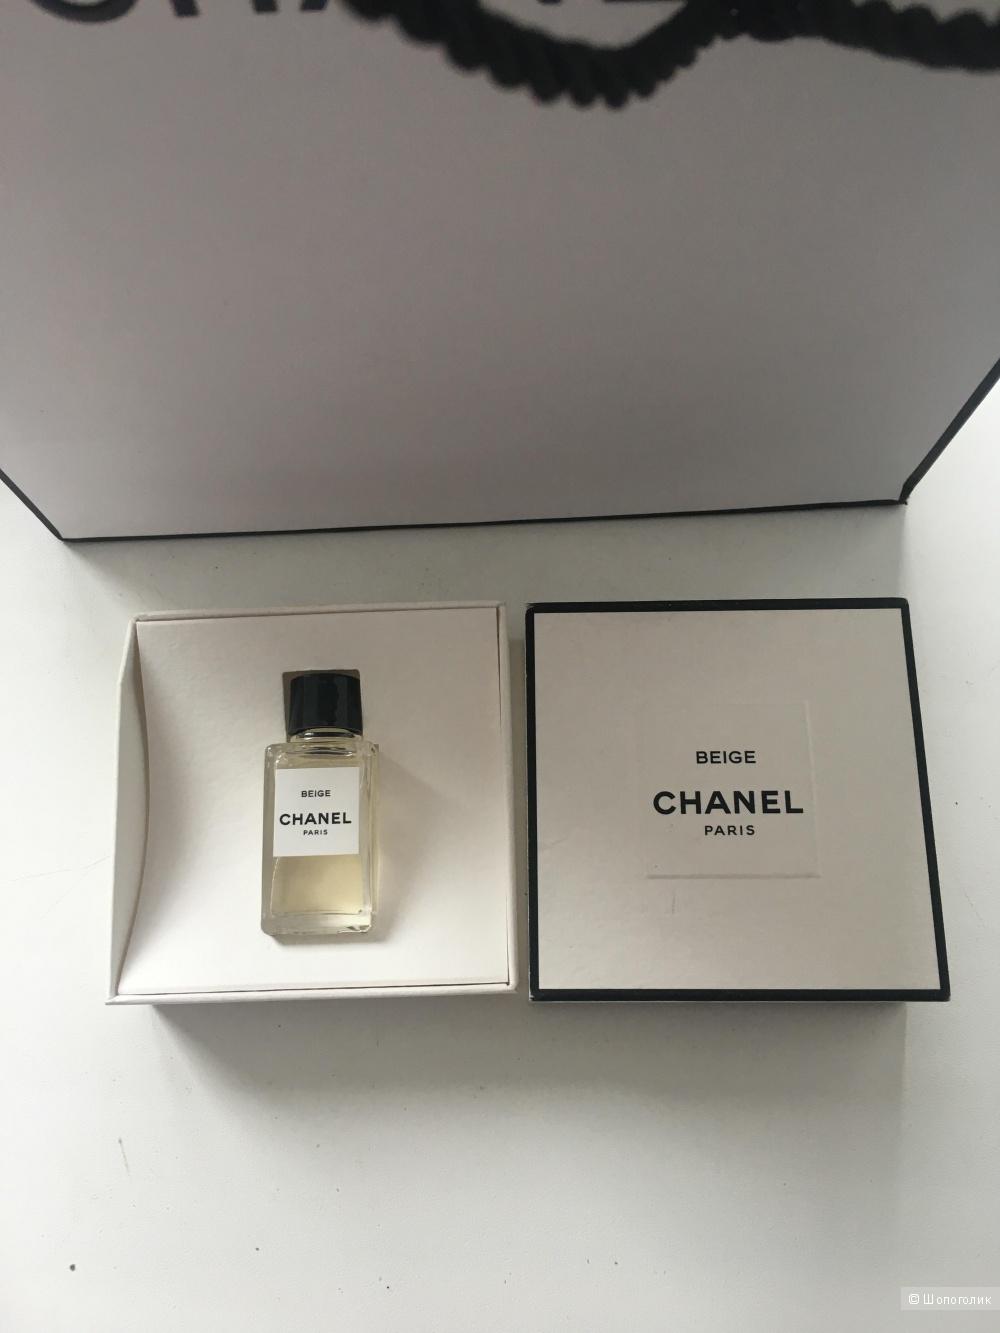 Миниатюра Chanel Beige 4ml